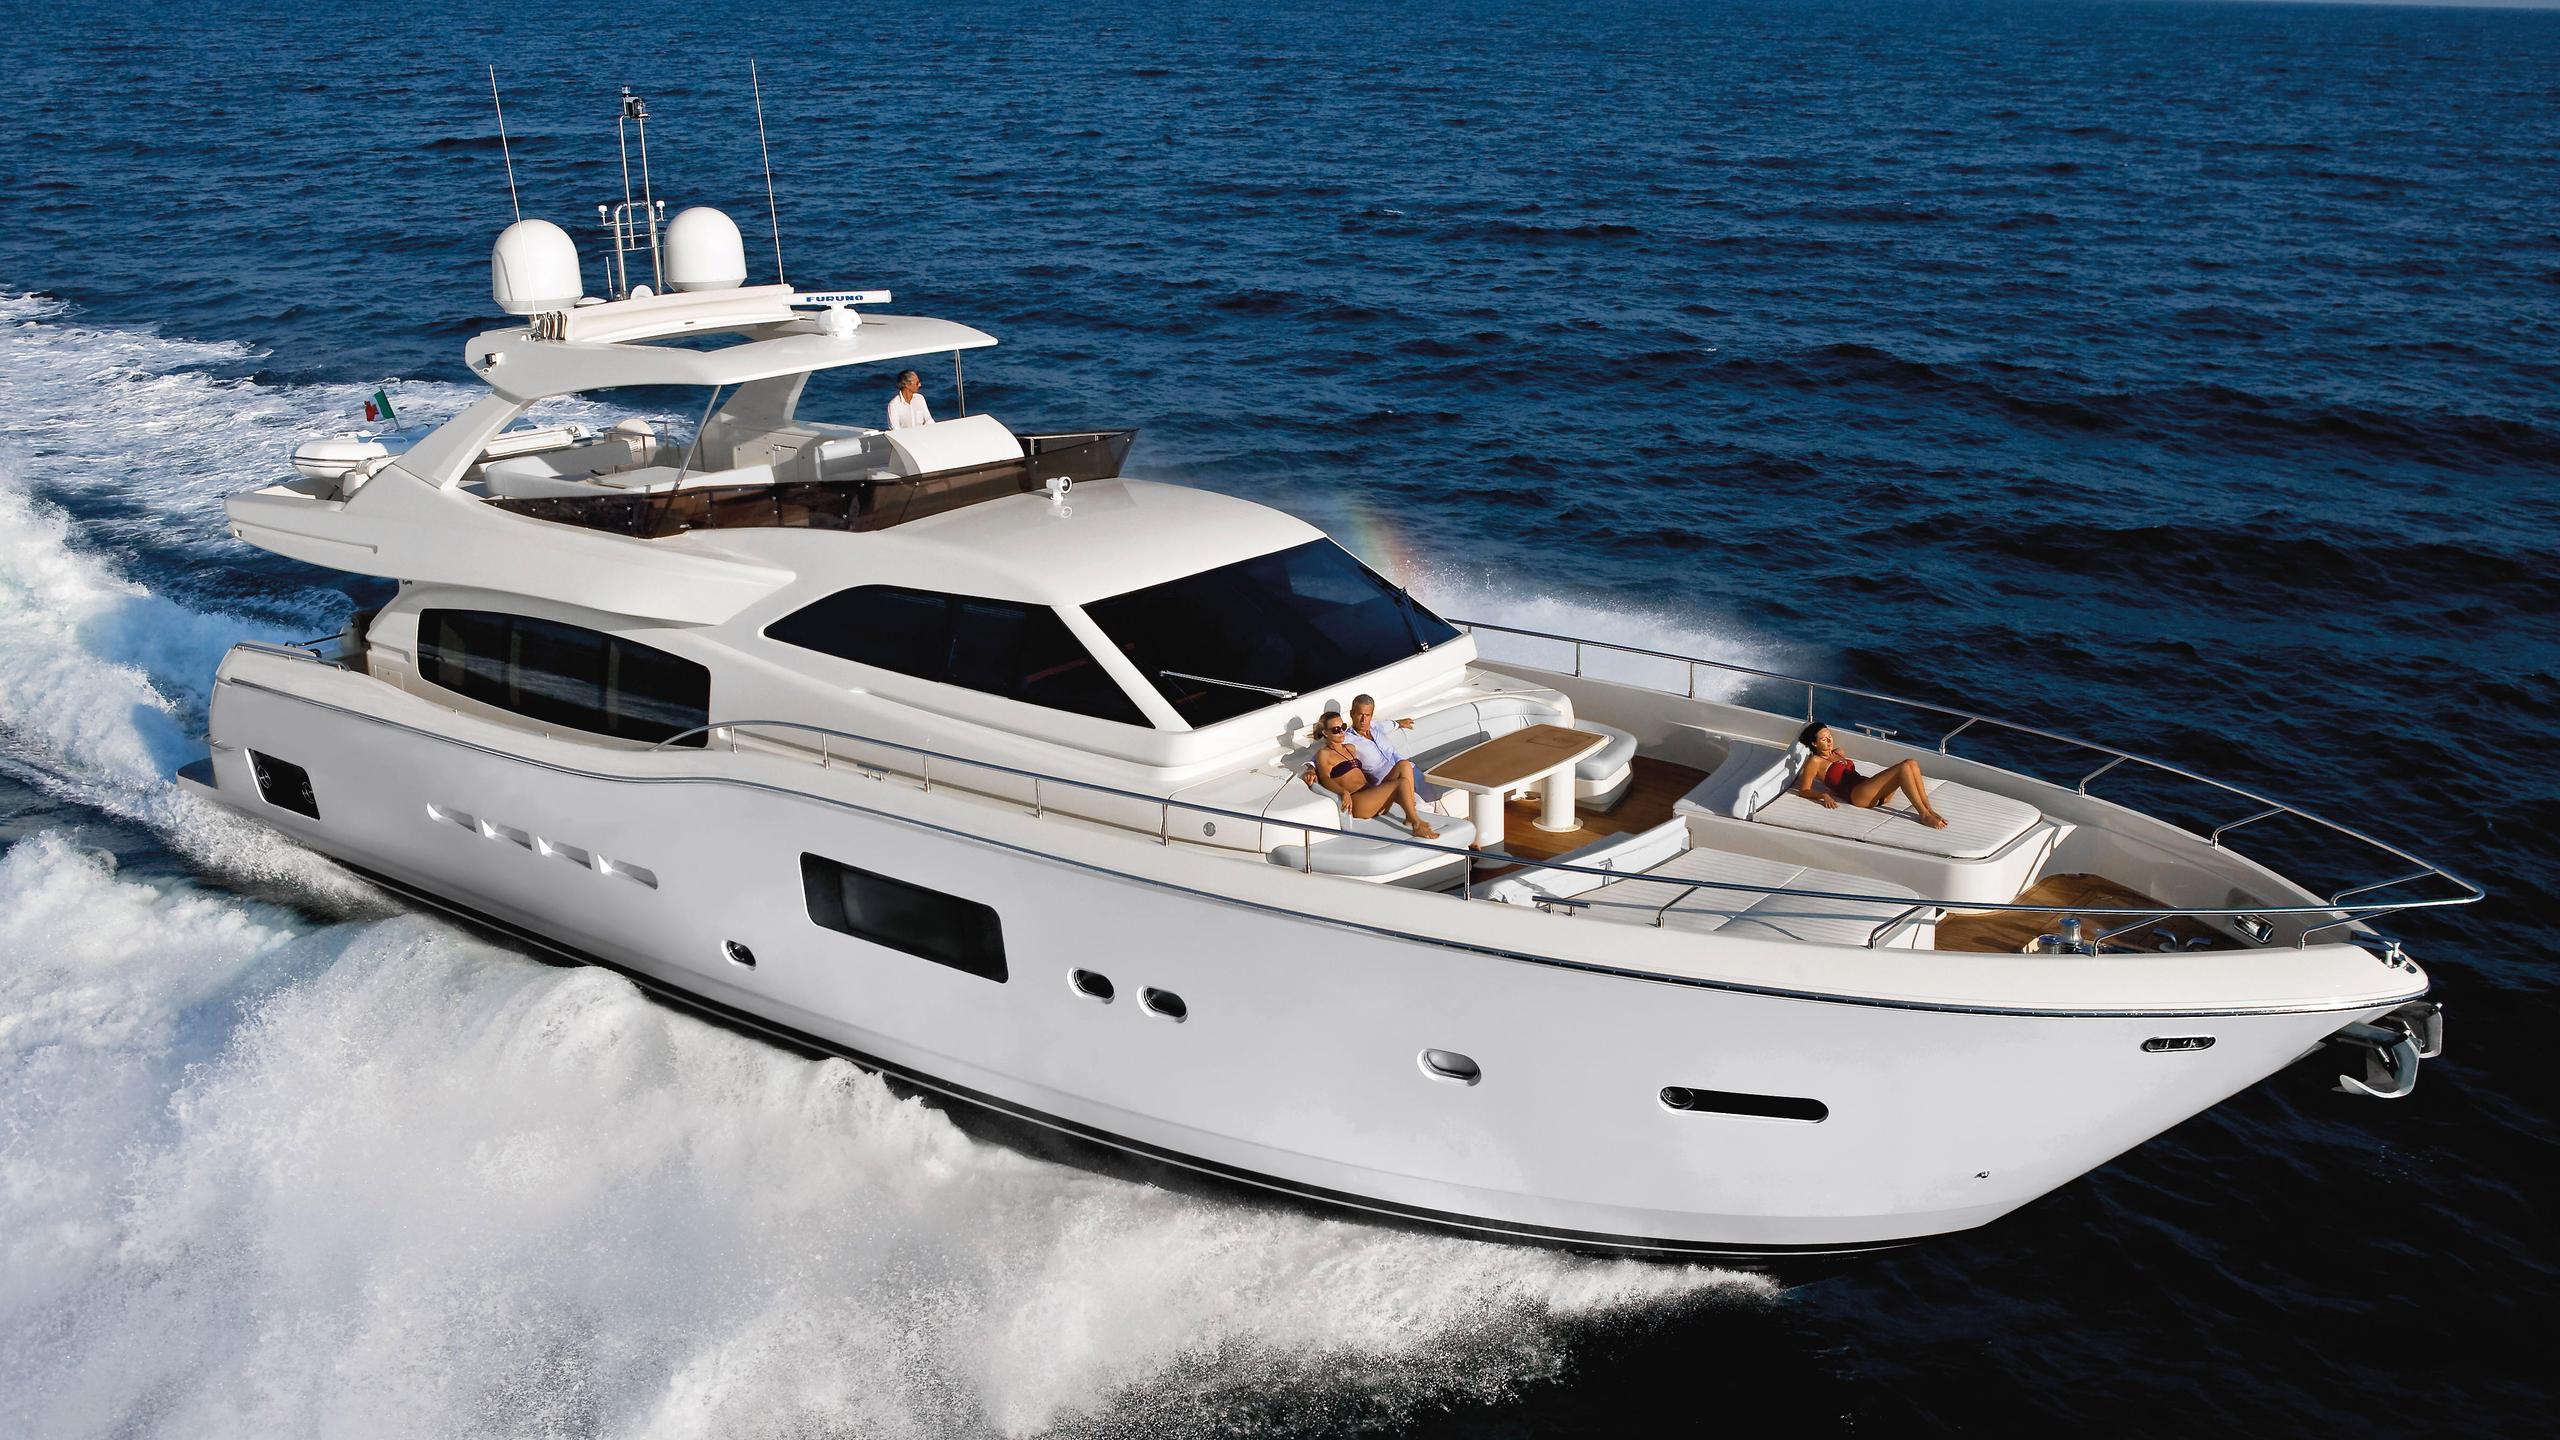 ferretti-altura-840-03-motor-yacht-ferretti-altura-840-2010-26m-cruising